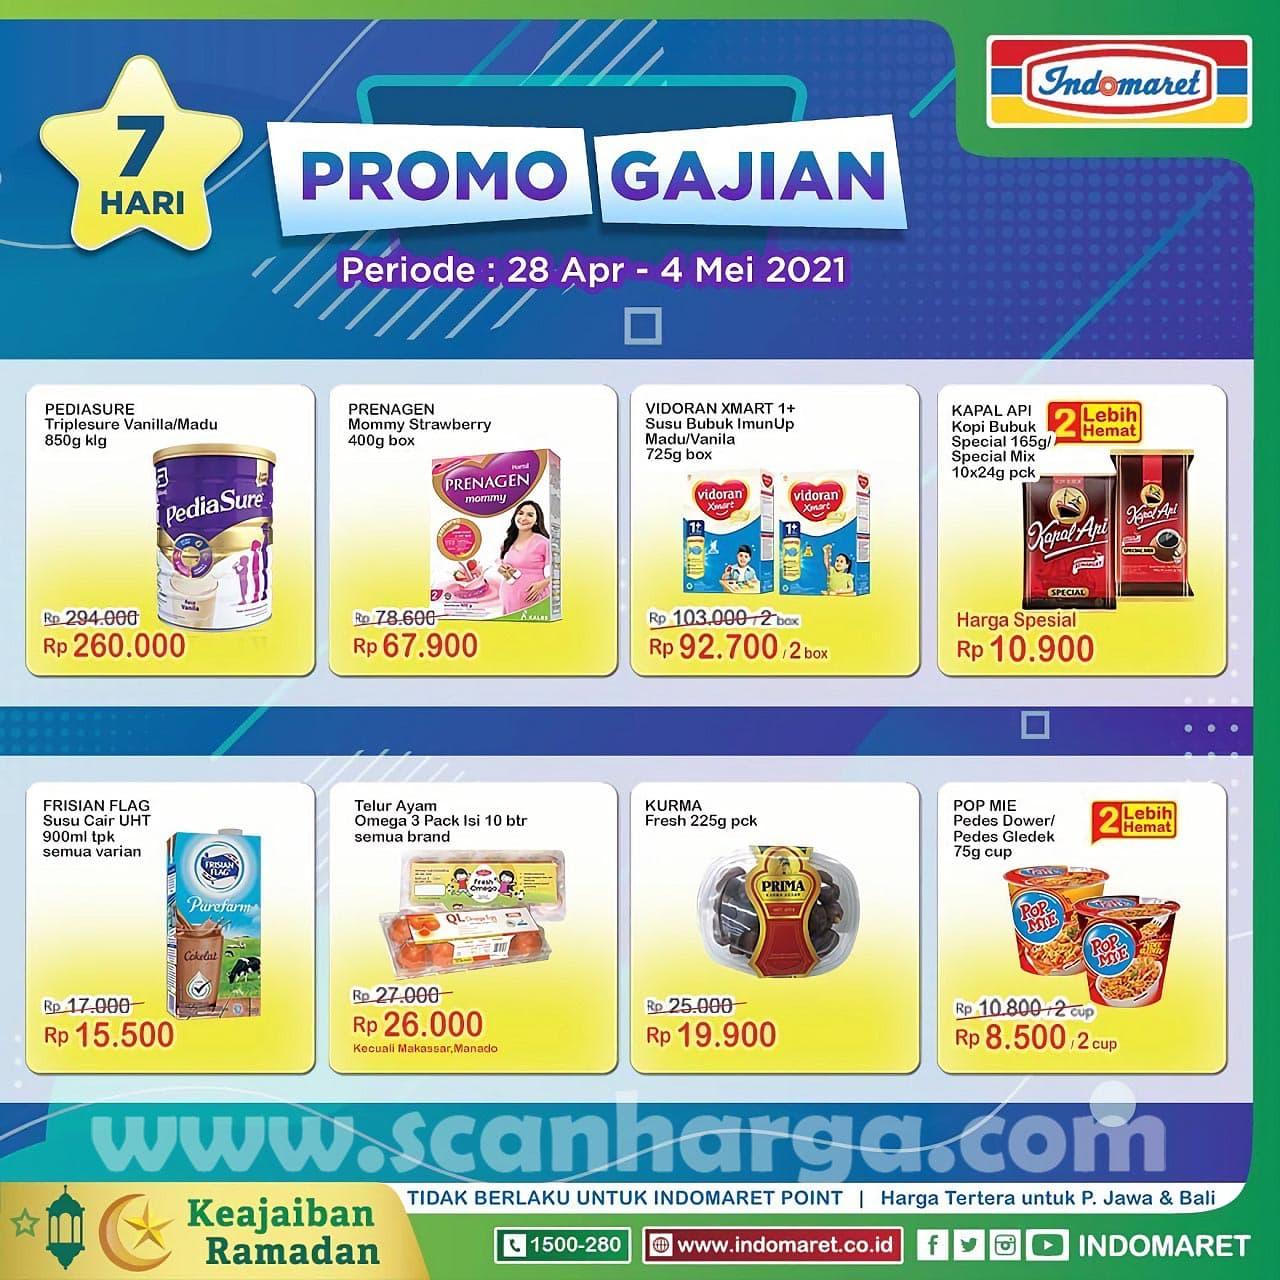 INDOMARET Promo GAJIAN Periode 28 April - 4 Mei 2021 1